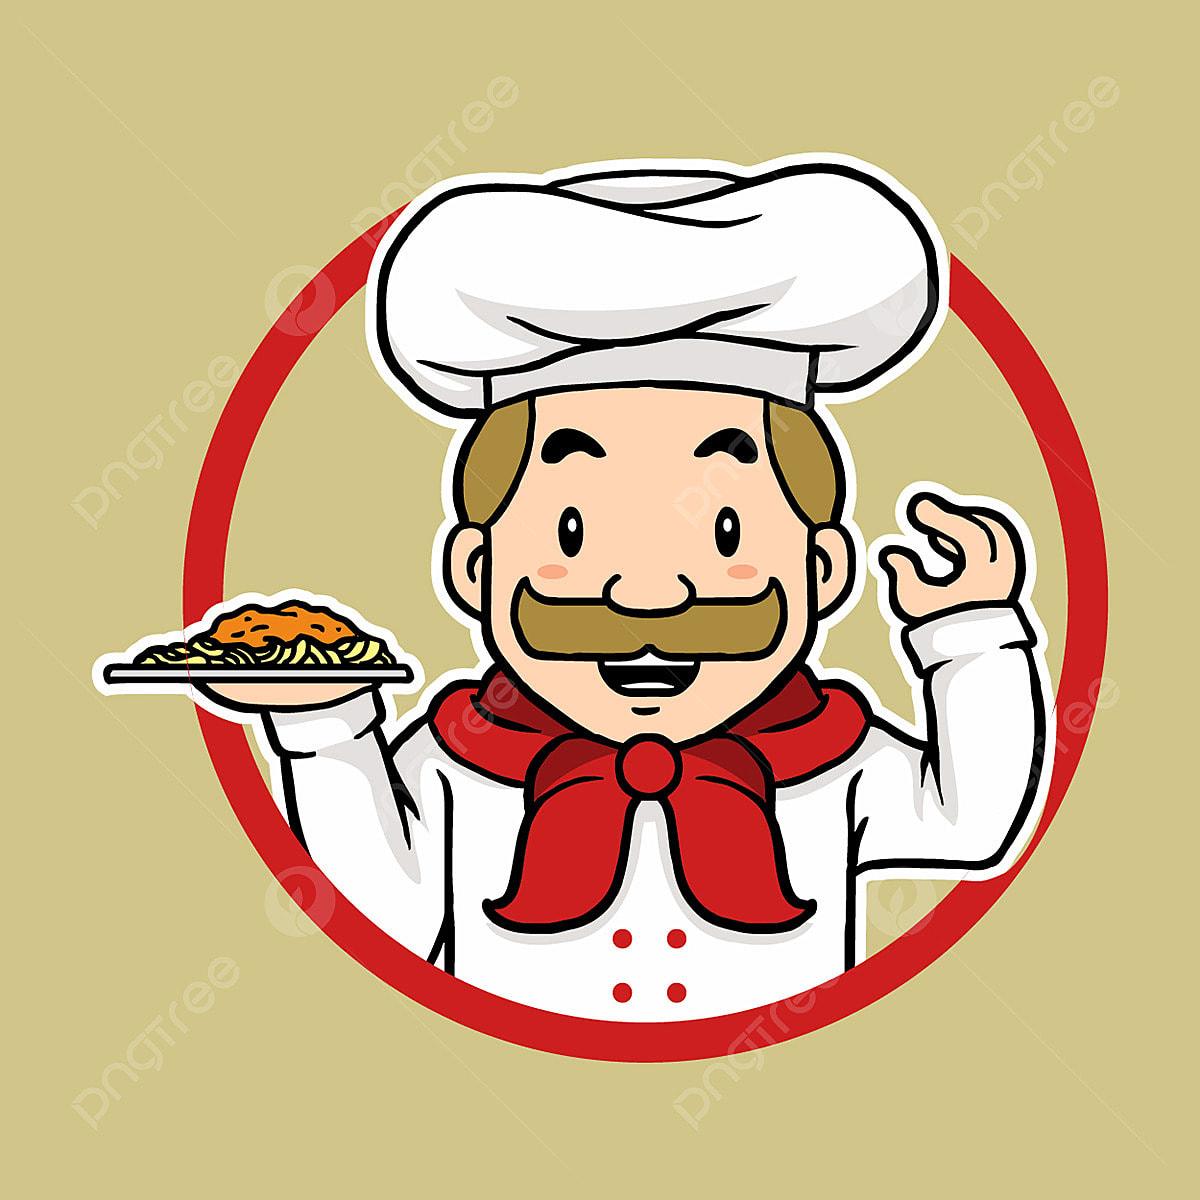 меня повар логотип картинка какой всех